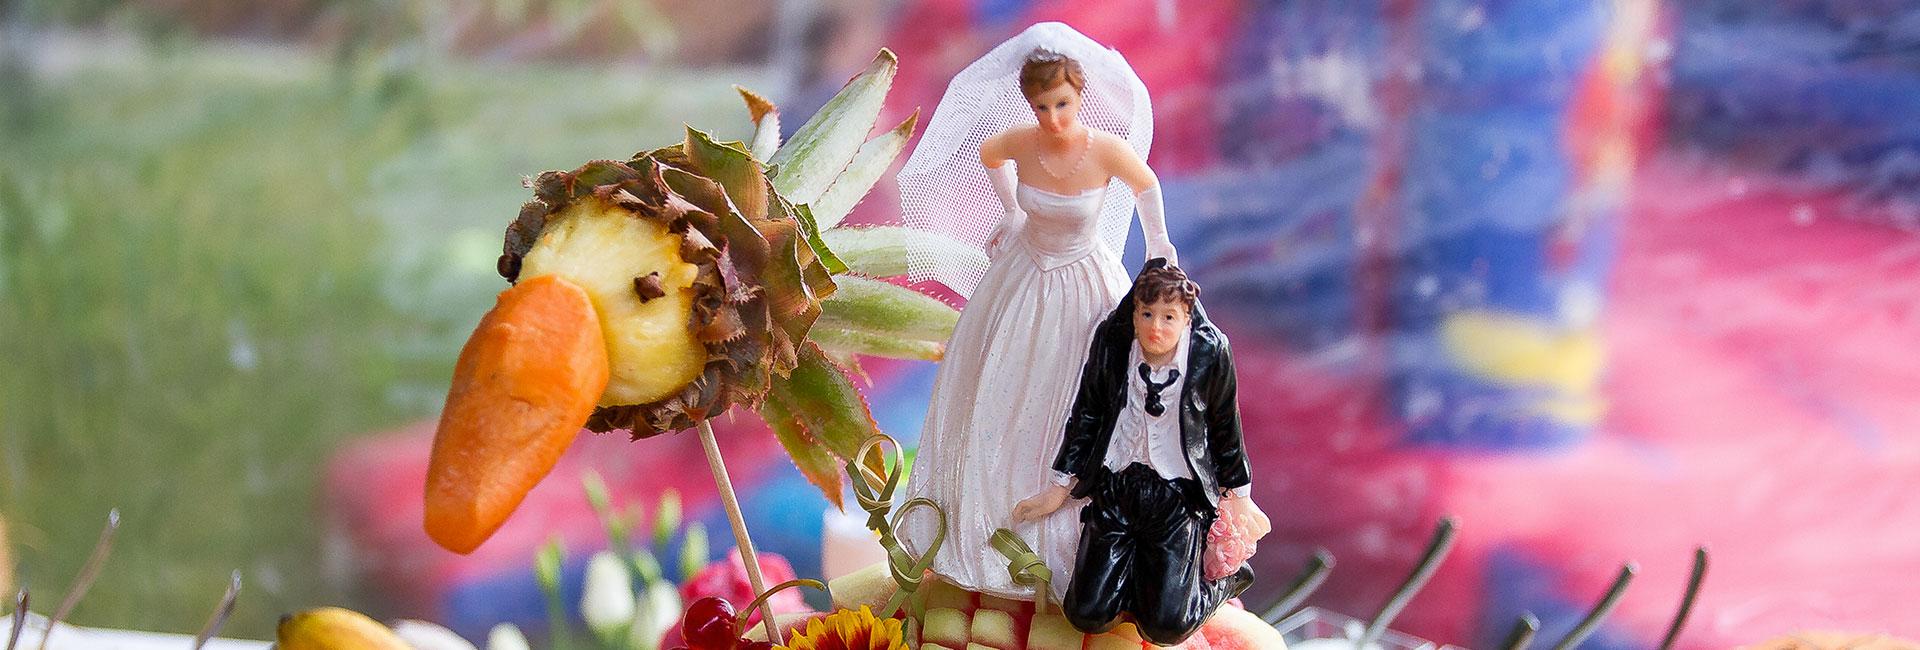 al dente group Dresden - Hochzeitsplanung, Catering